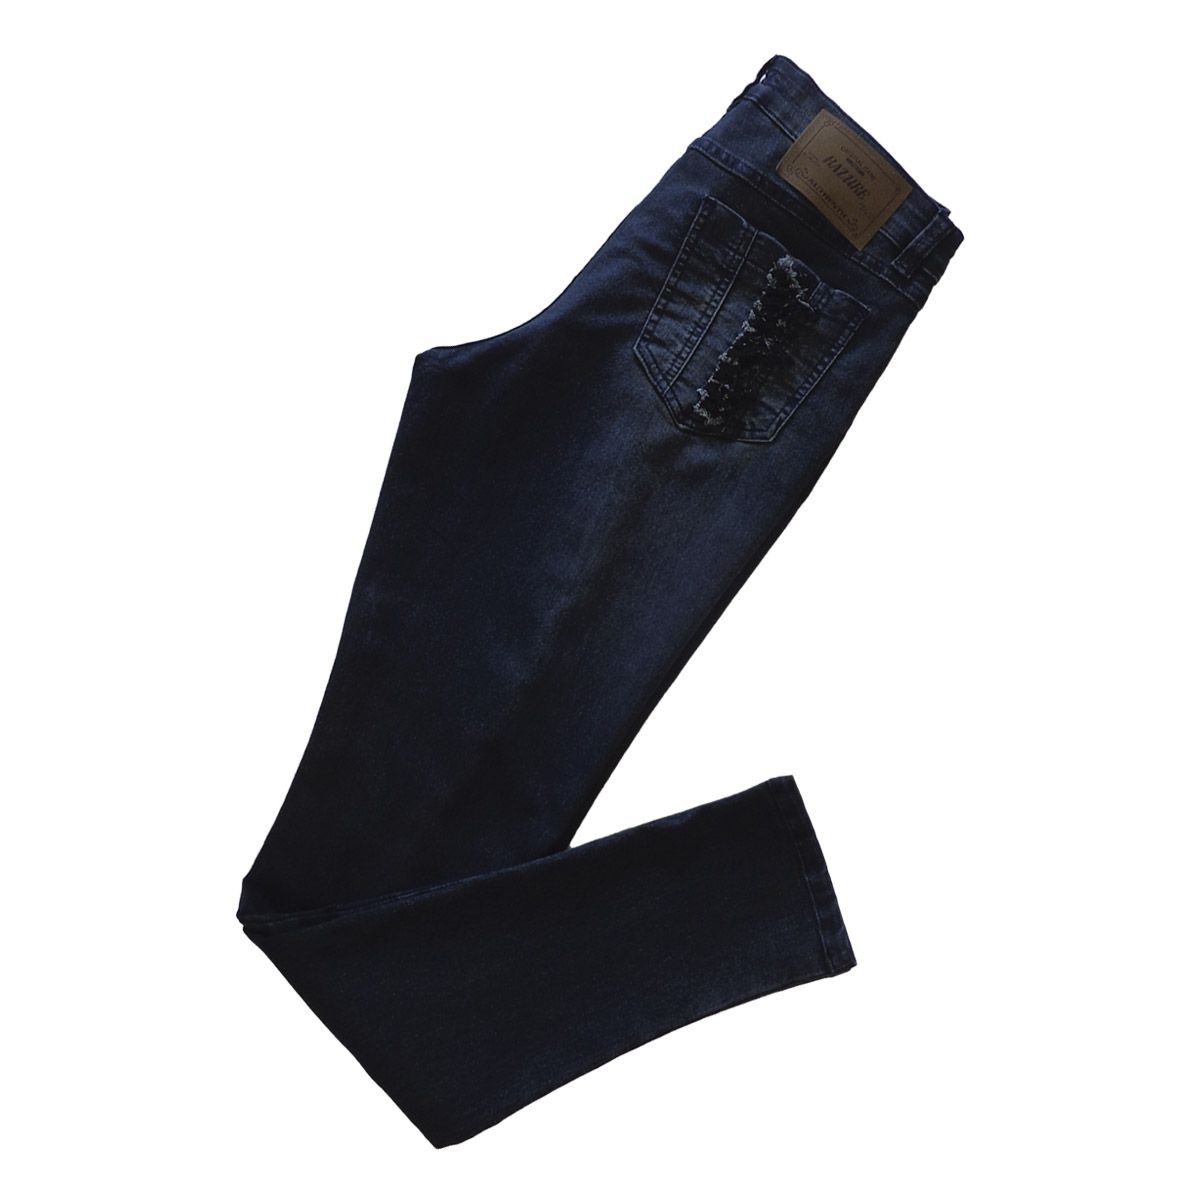 Calça Jeans Feminina Skinny Rasgada Plus Size Tamanho 46